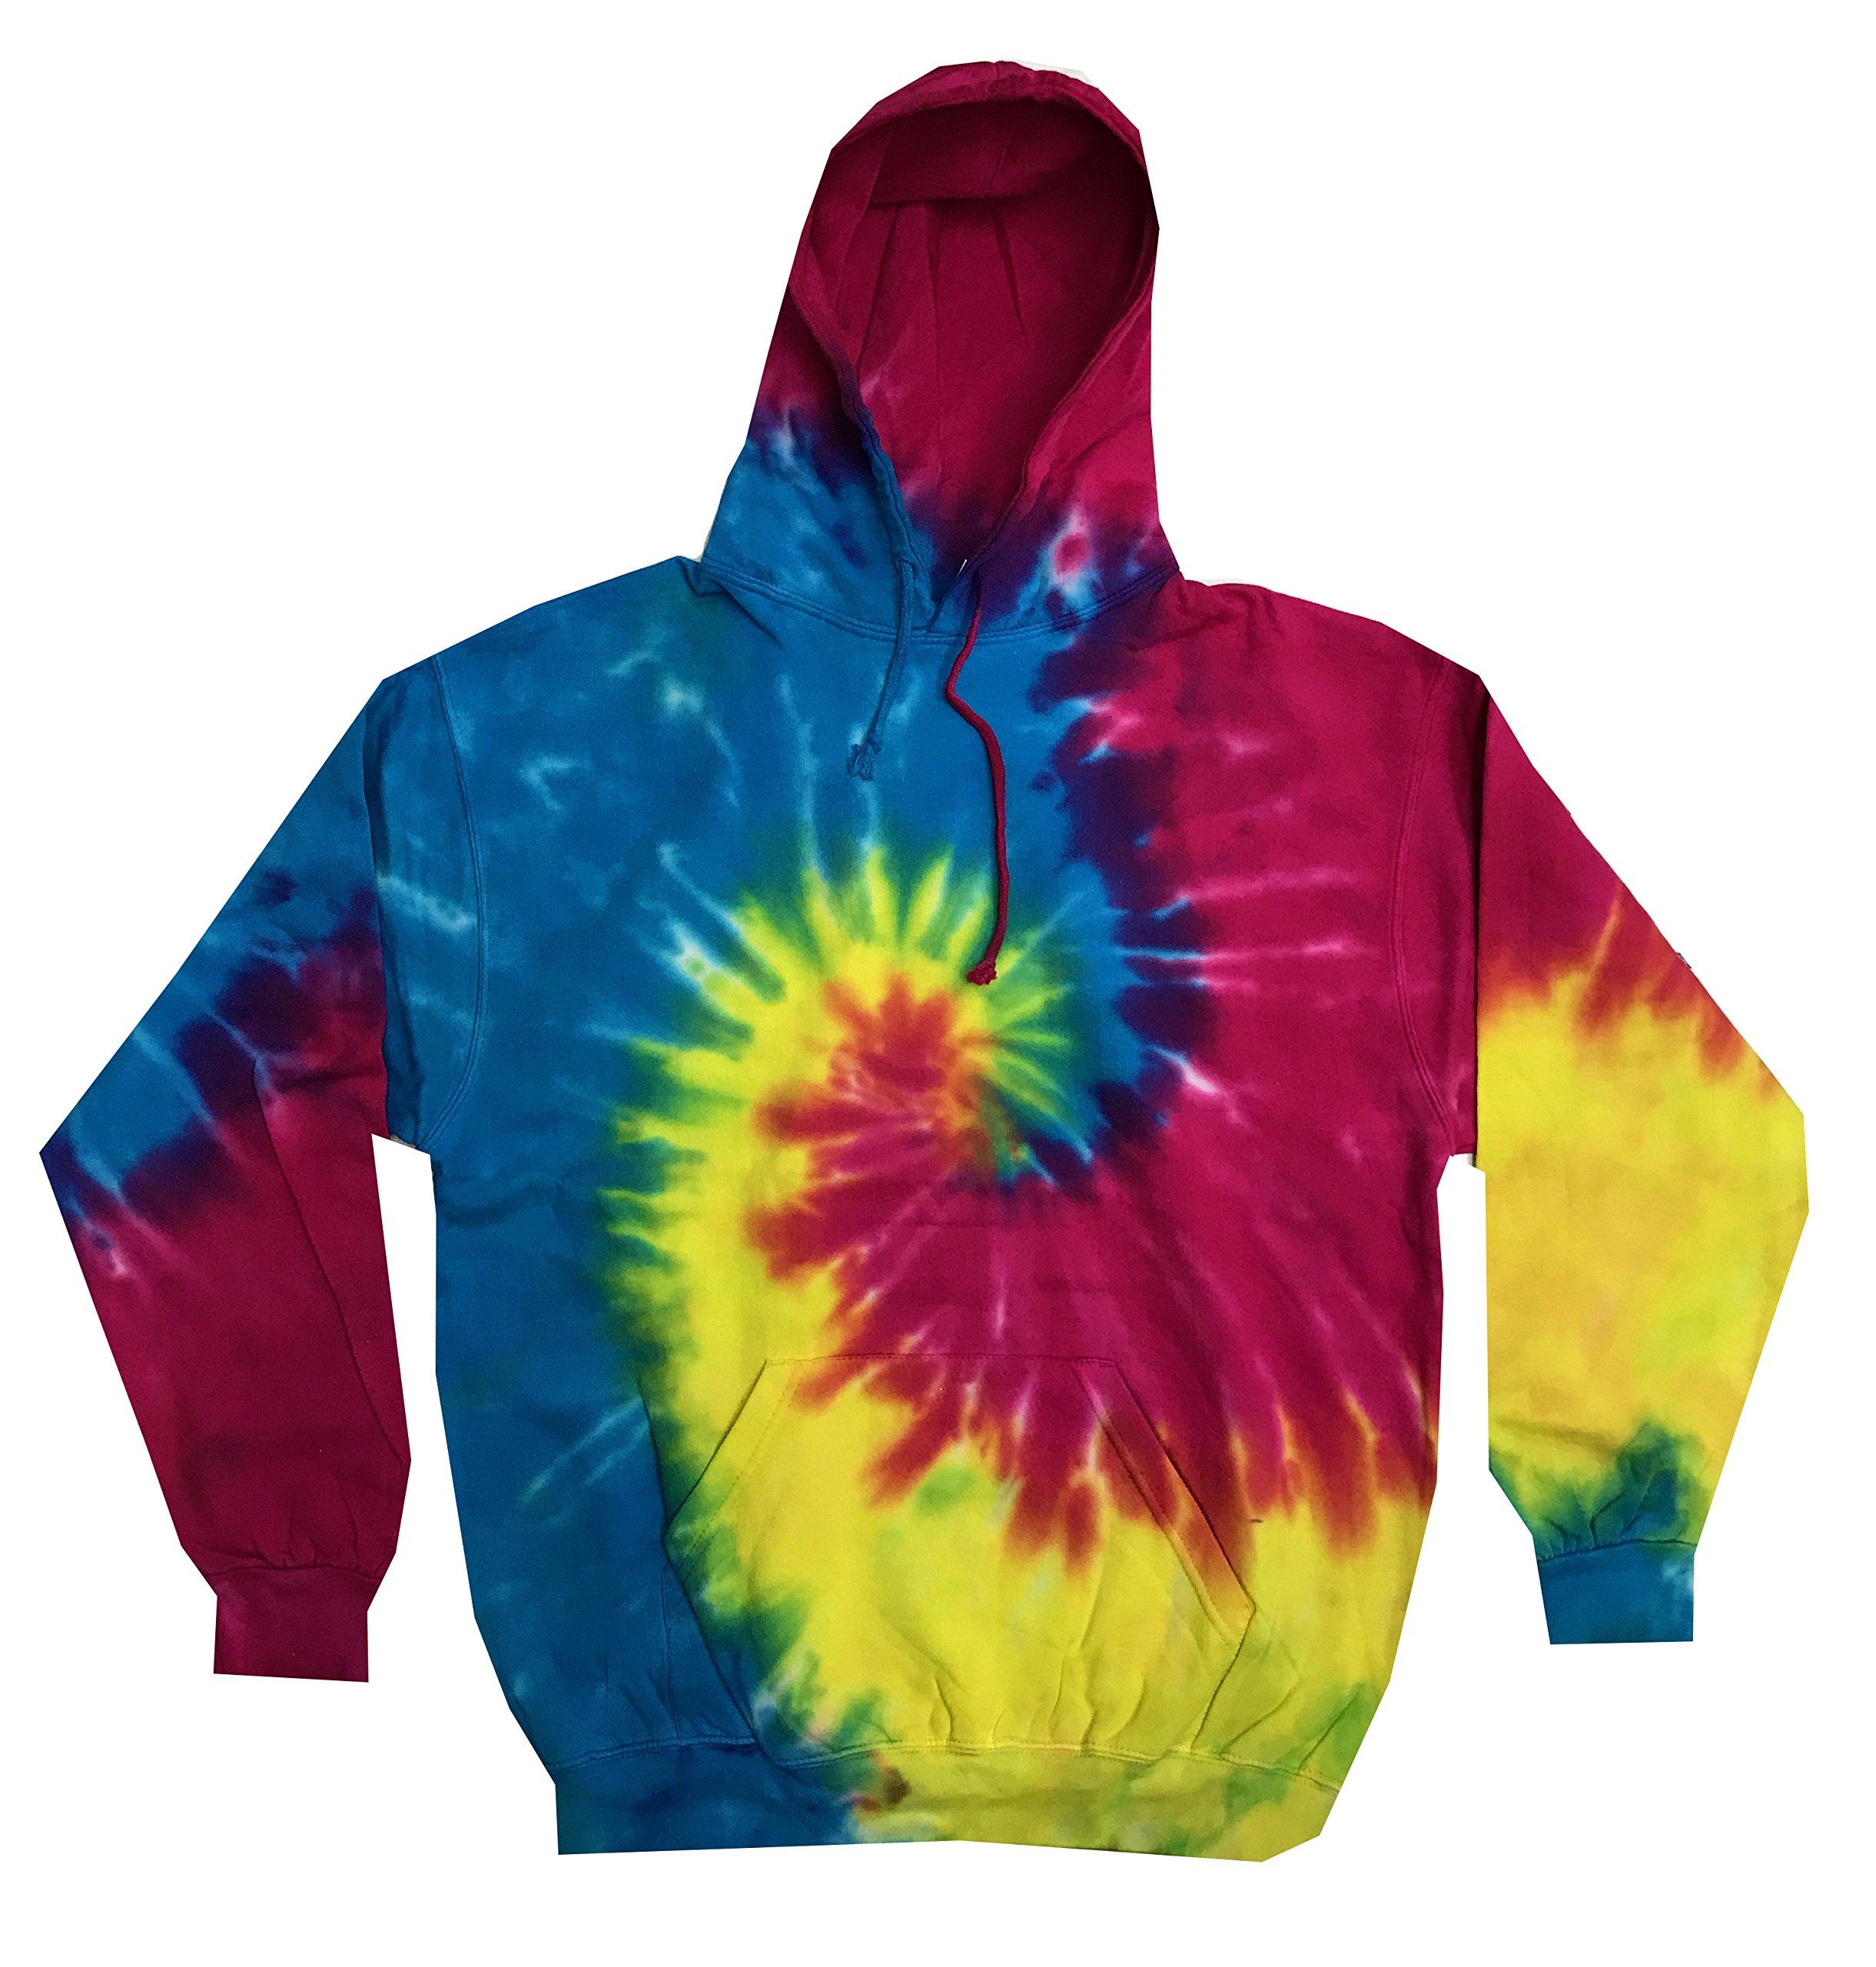 Adult tie dye sweatshirt recommend